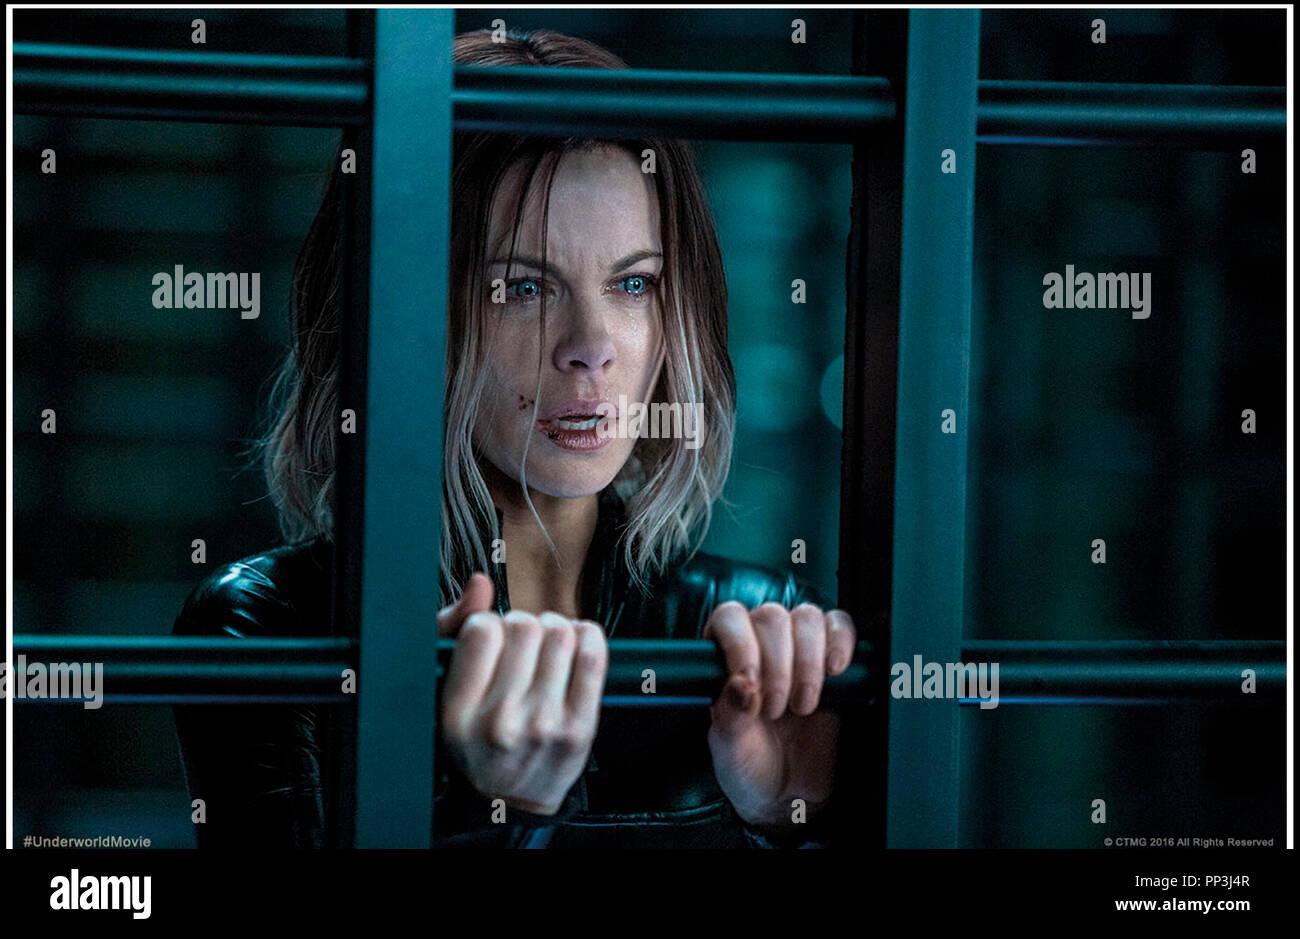 Prod DB © Lakeshore Entertainment - Screen Gems - Sketch Films / DR